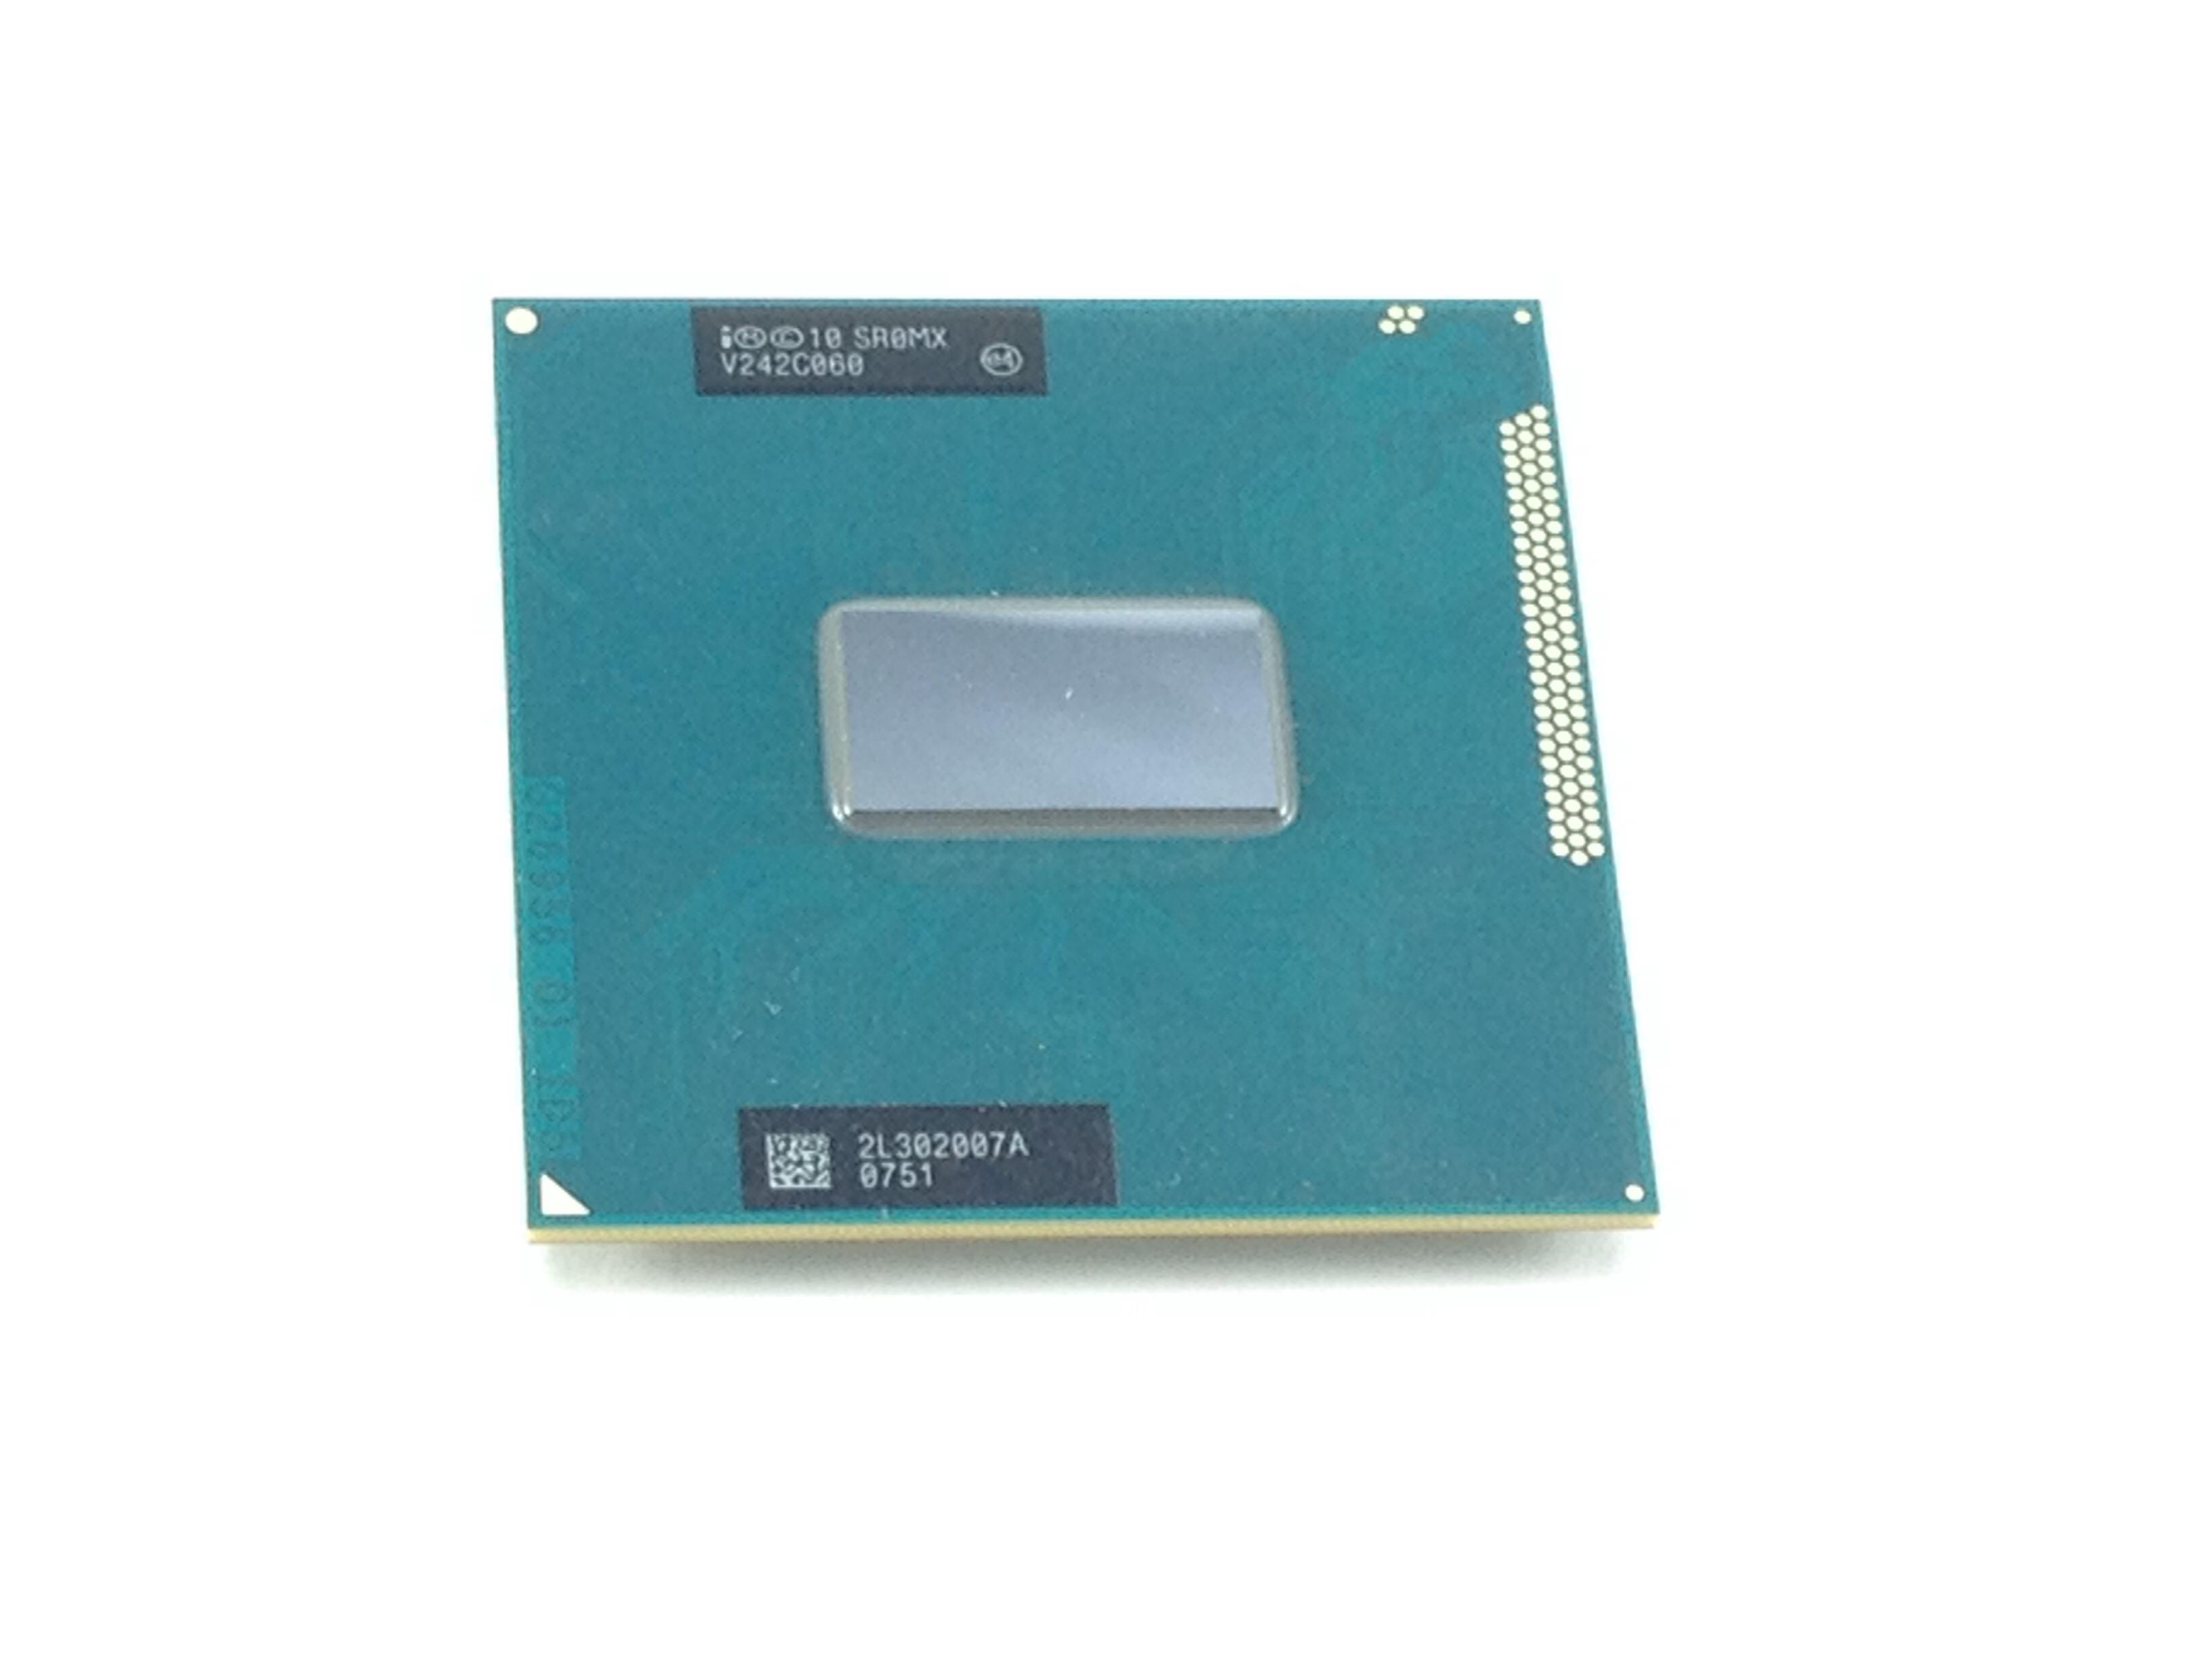 Intel I5-3320M 2.66Ghz Dual-Core 3MB Cache Processor (SR0MX)